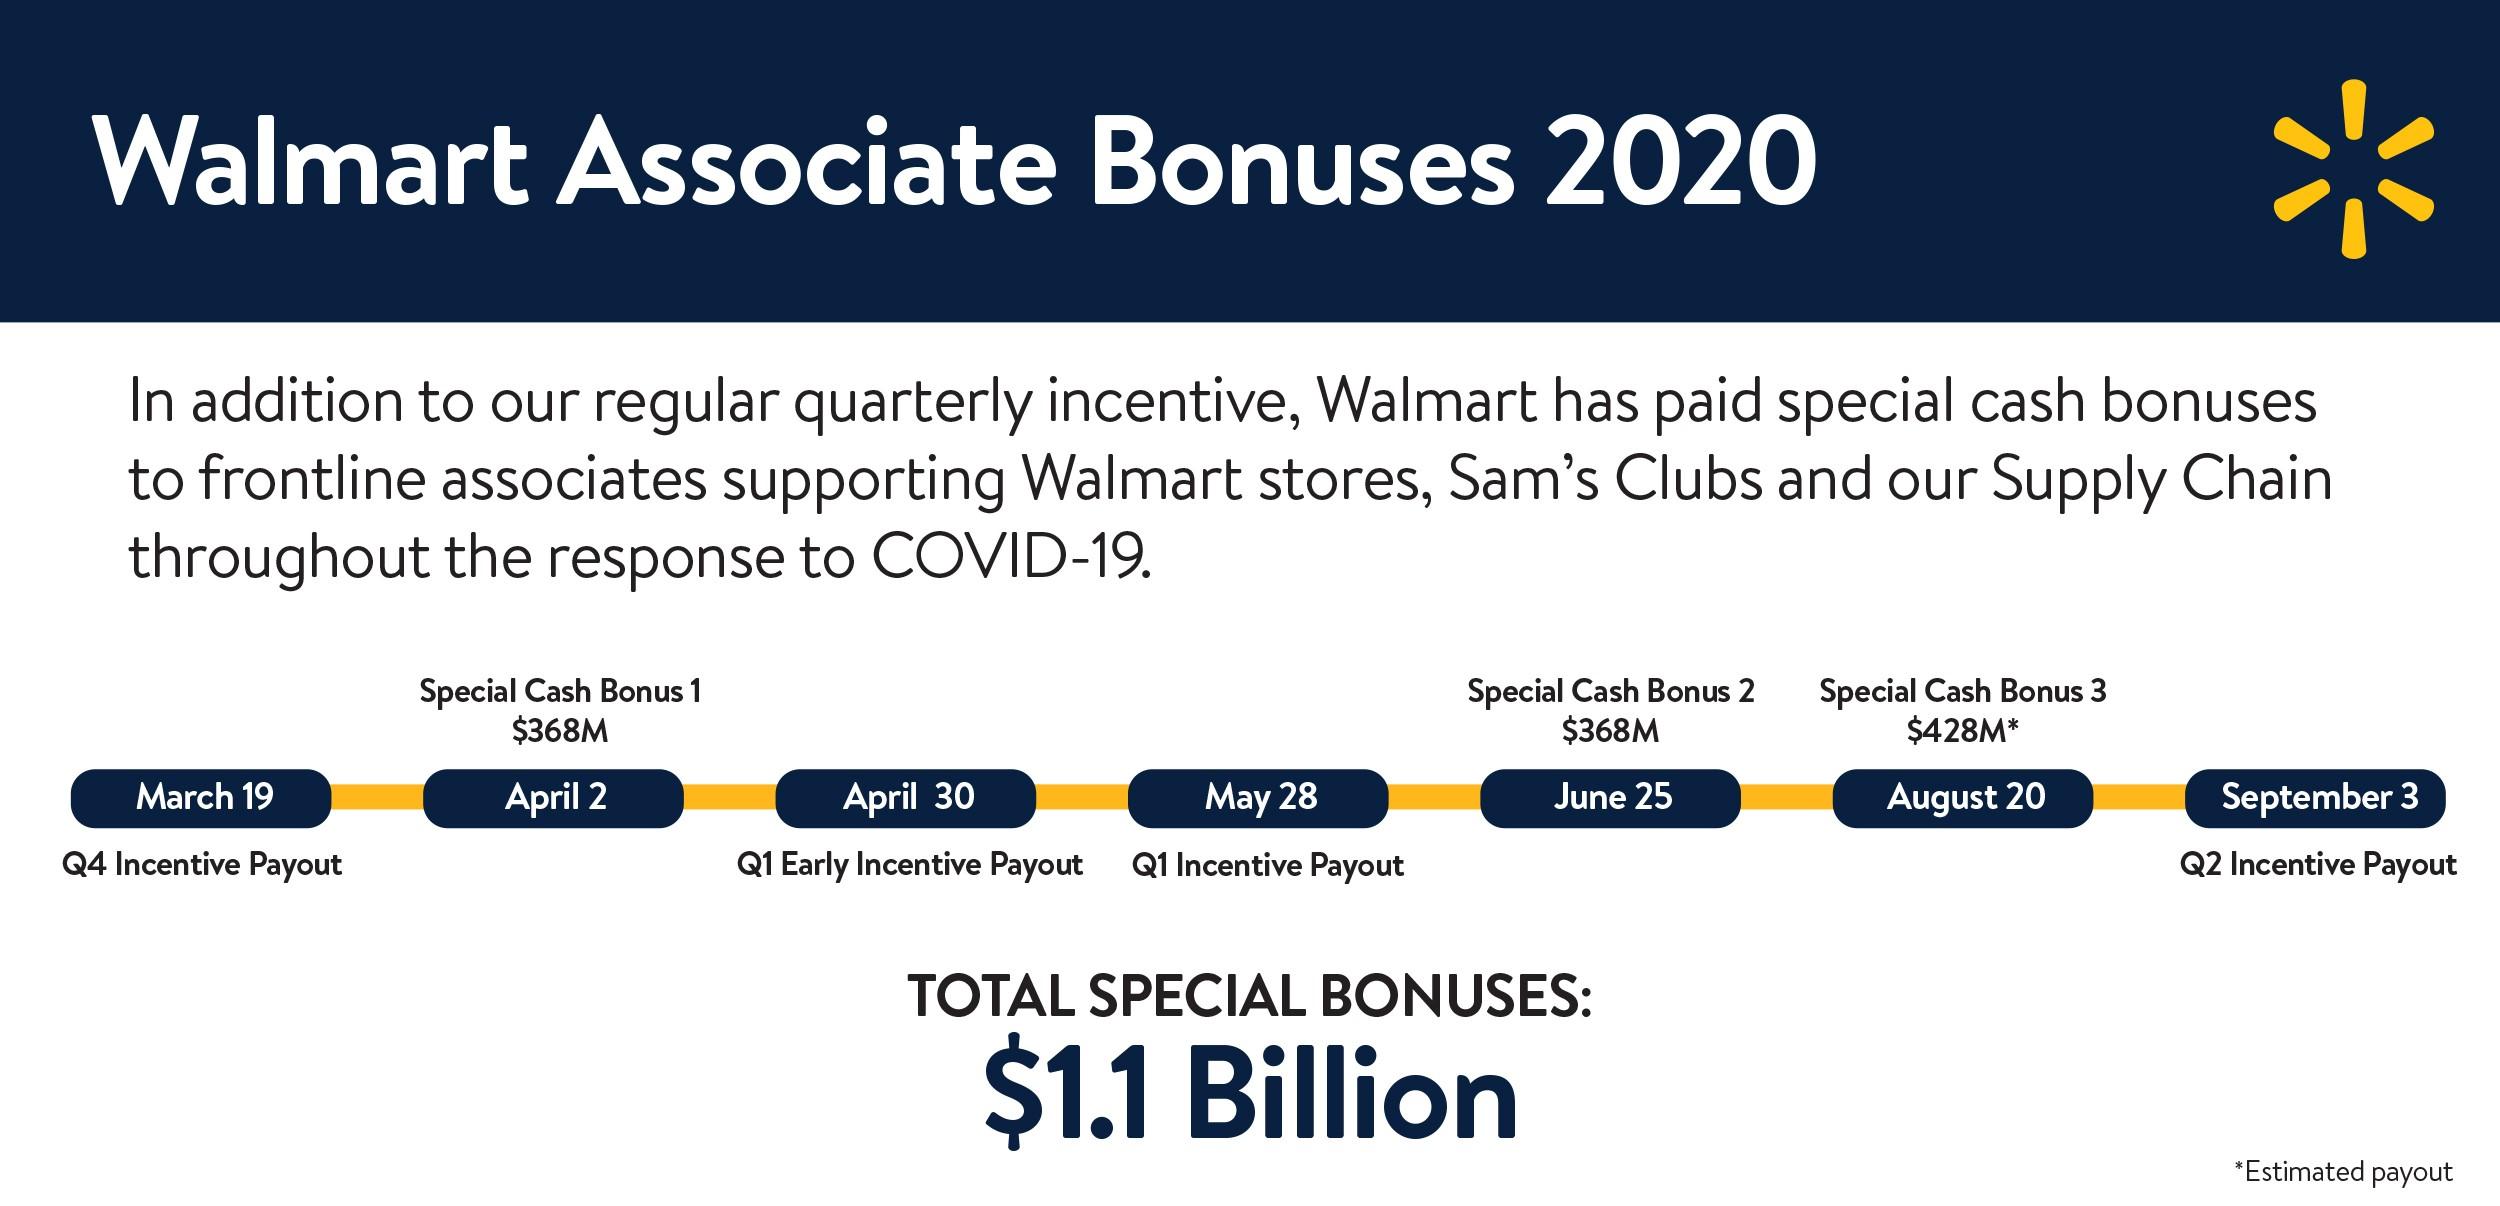 Walmart Associate Bonuses 2020 Graph